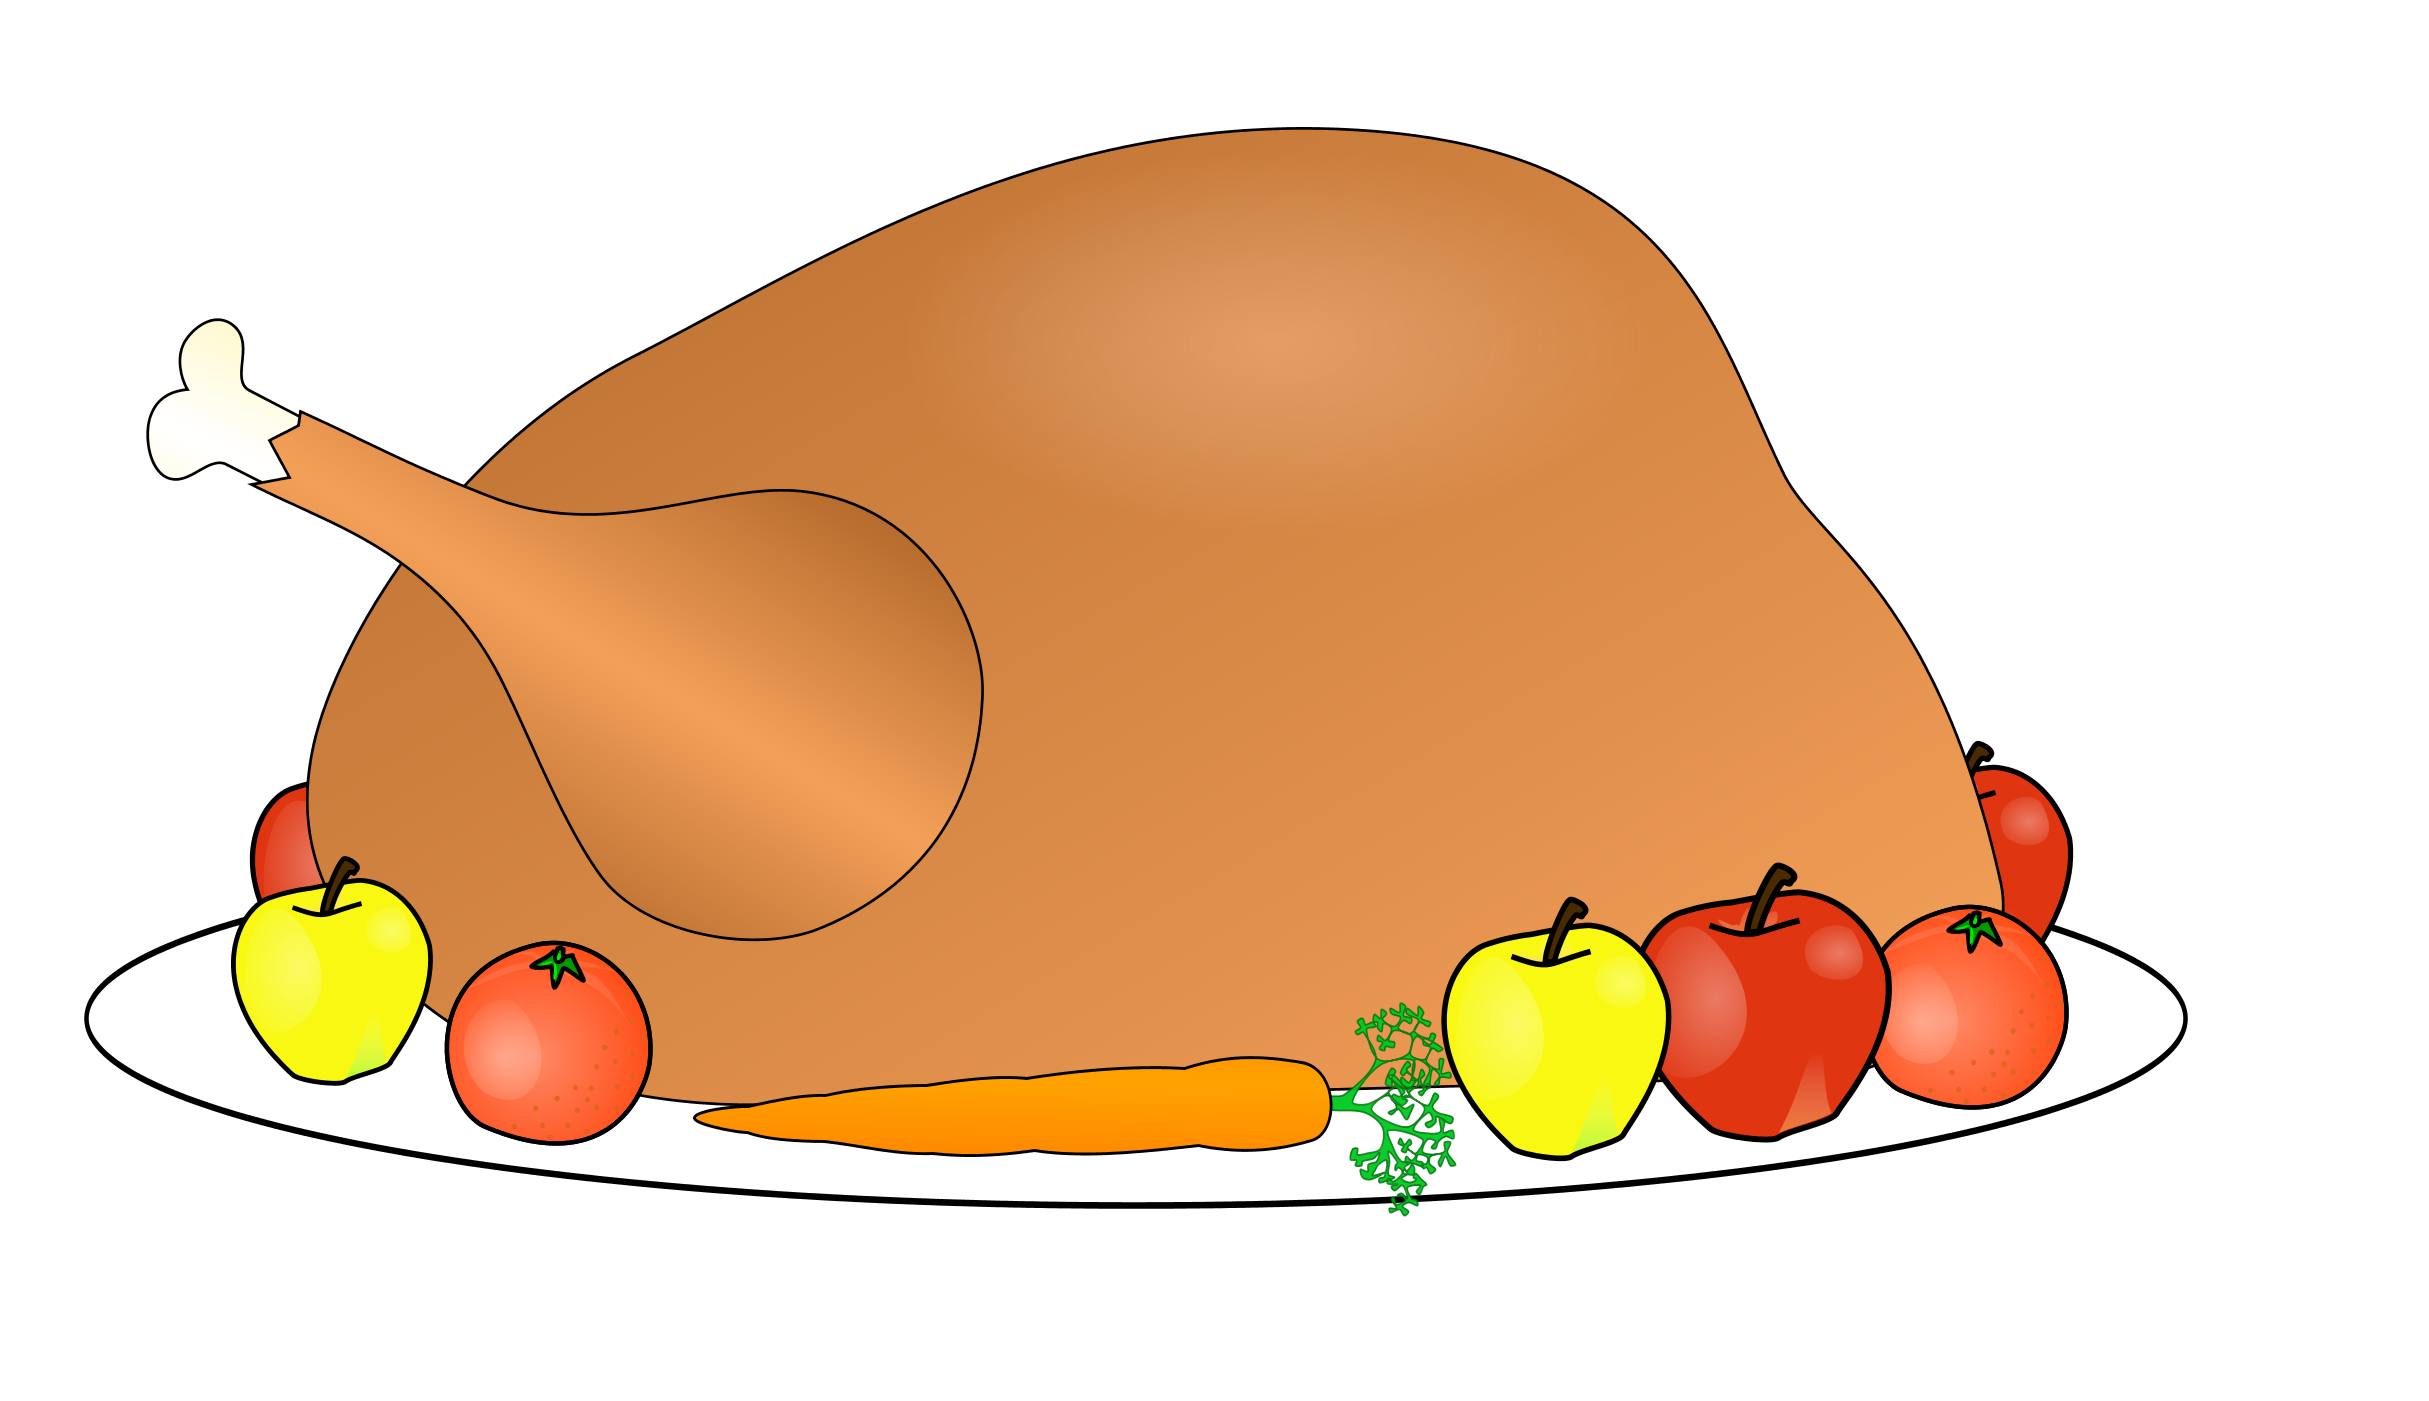 Cooked turkey leg clipart.